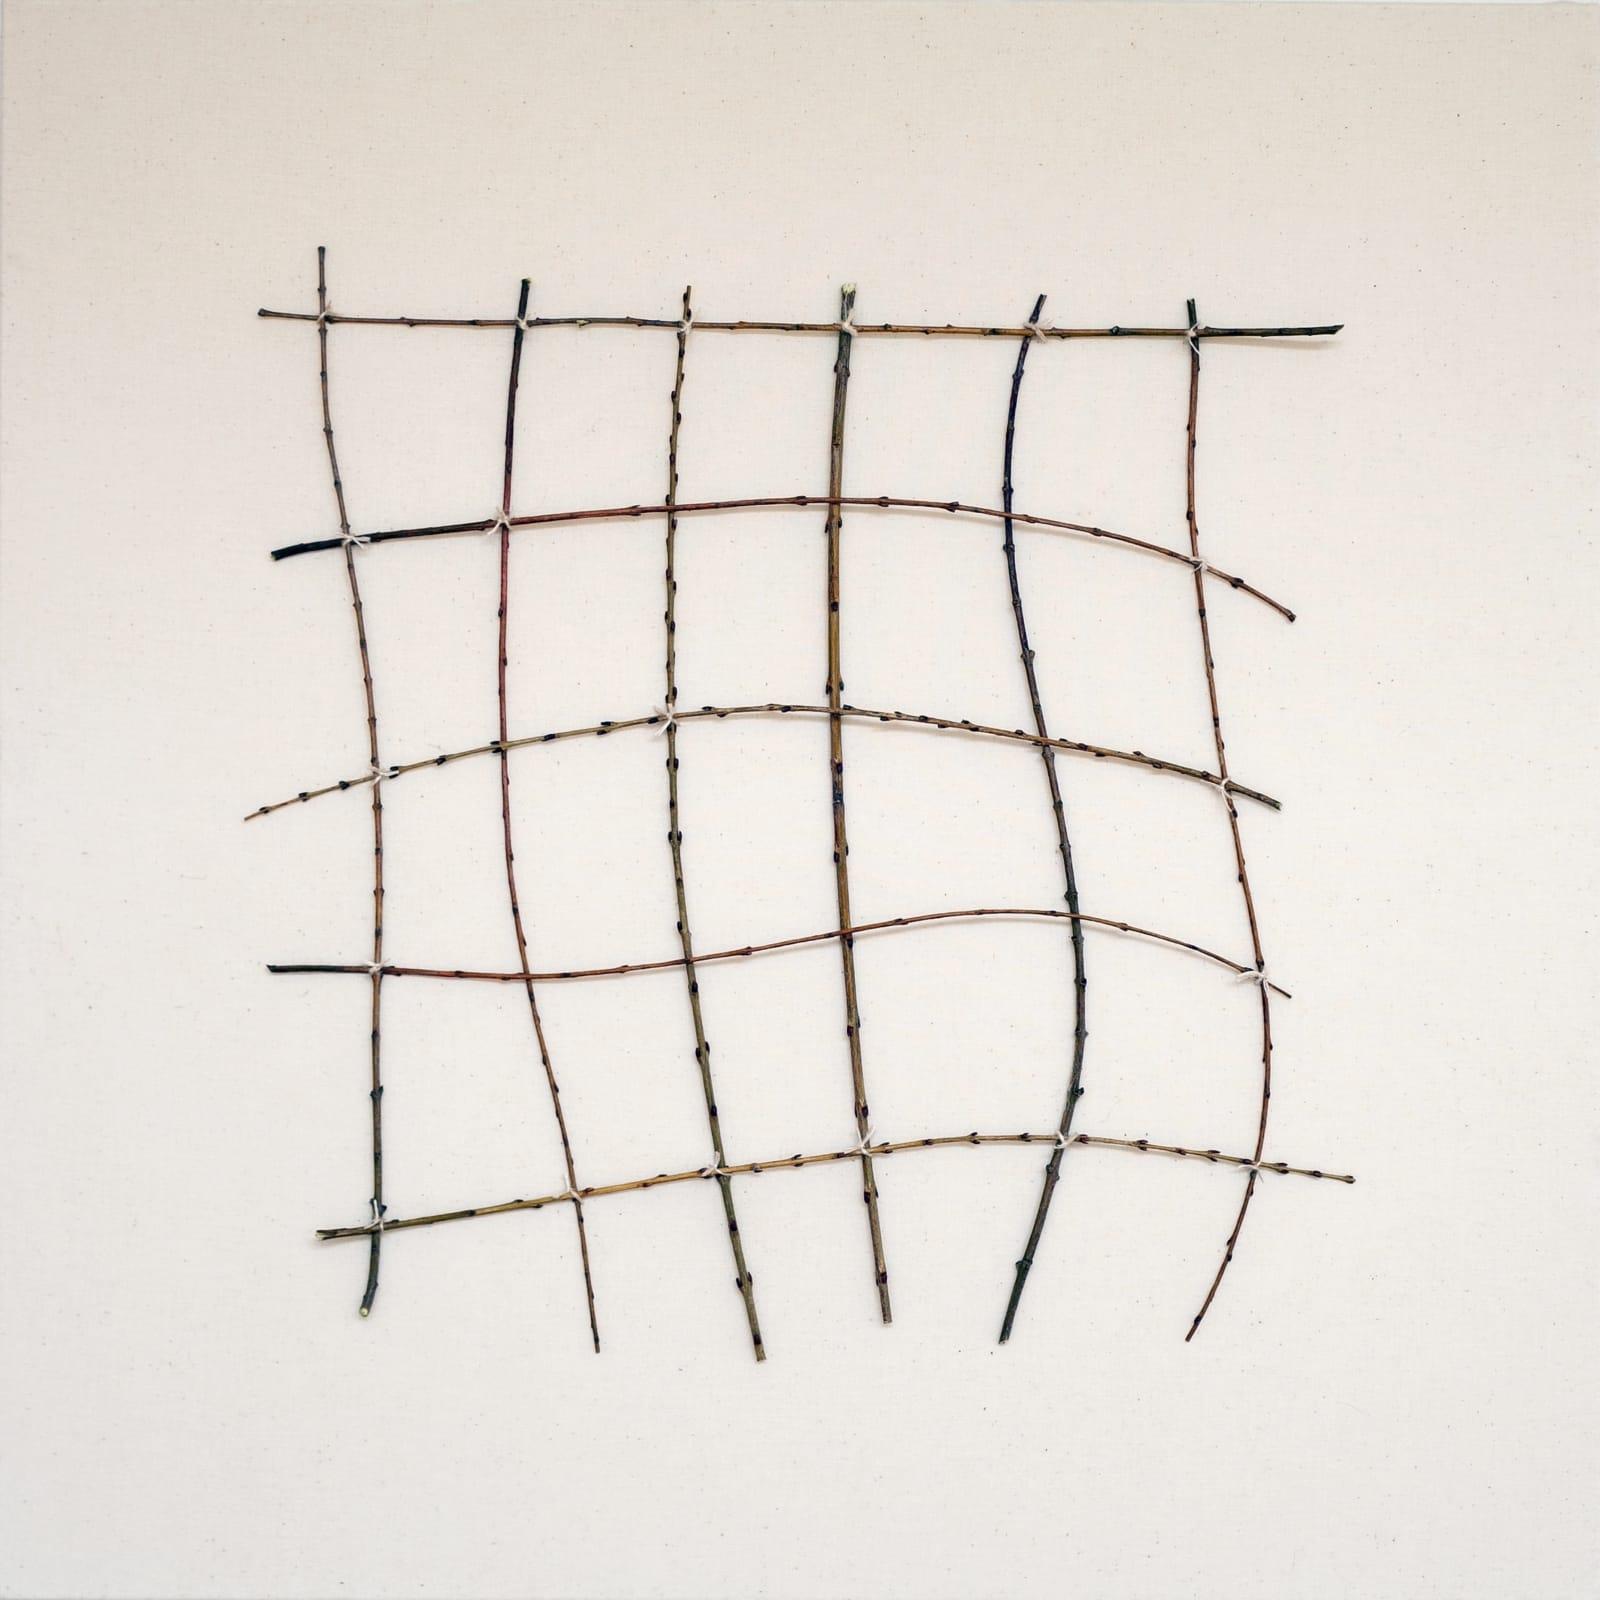 Bastienne Schmidt Wavering Grid, 2021 Cotton duck fabric with Nijiki sticks and thread. 24 x 24 in. (BS 302) $6,000